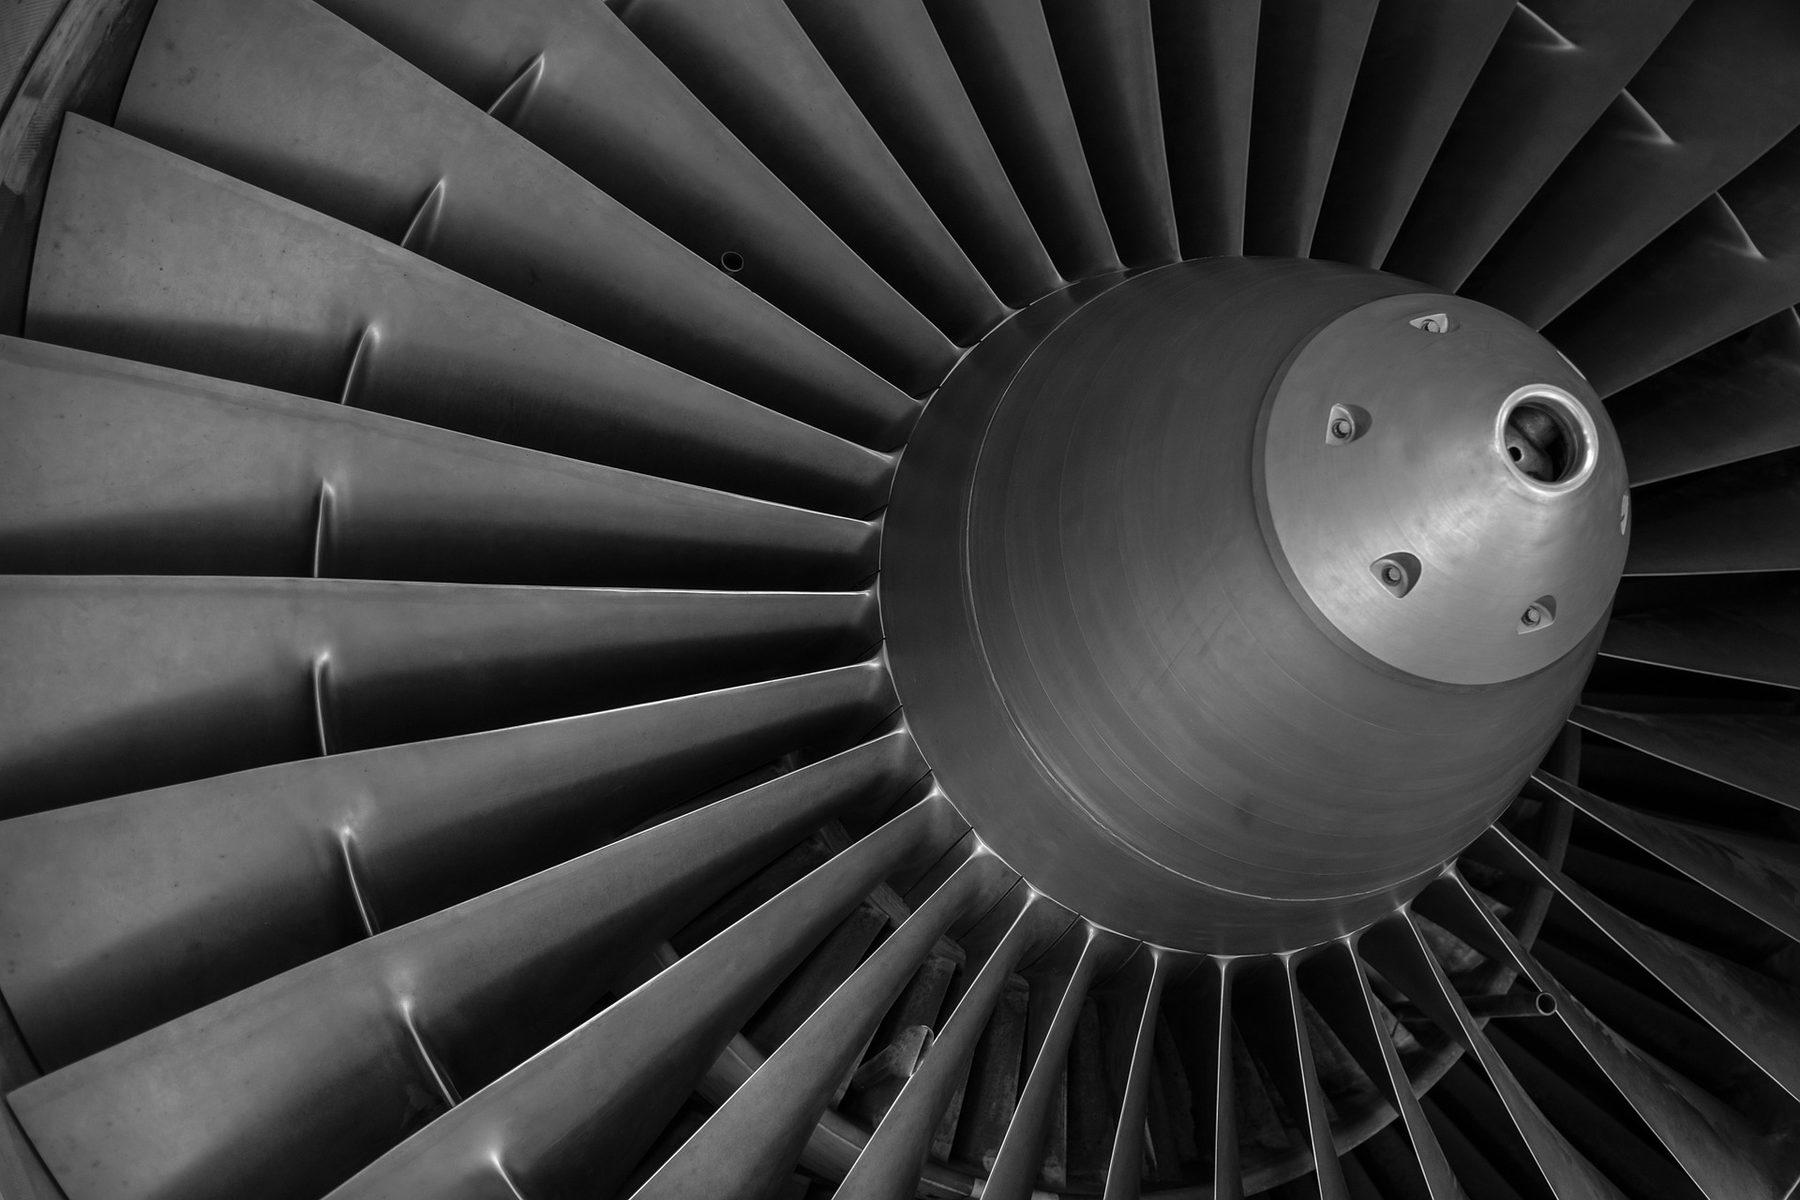 Mechanical Engineering  (Sector Header: Turbine Rotor)